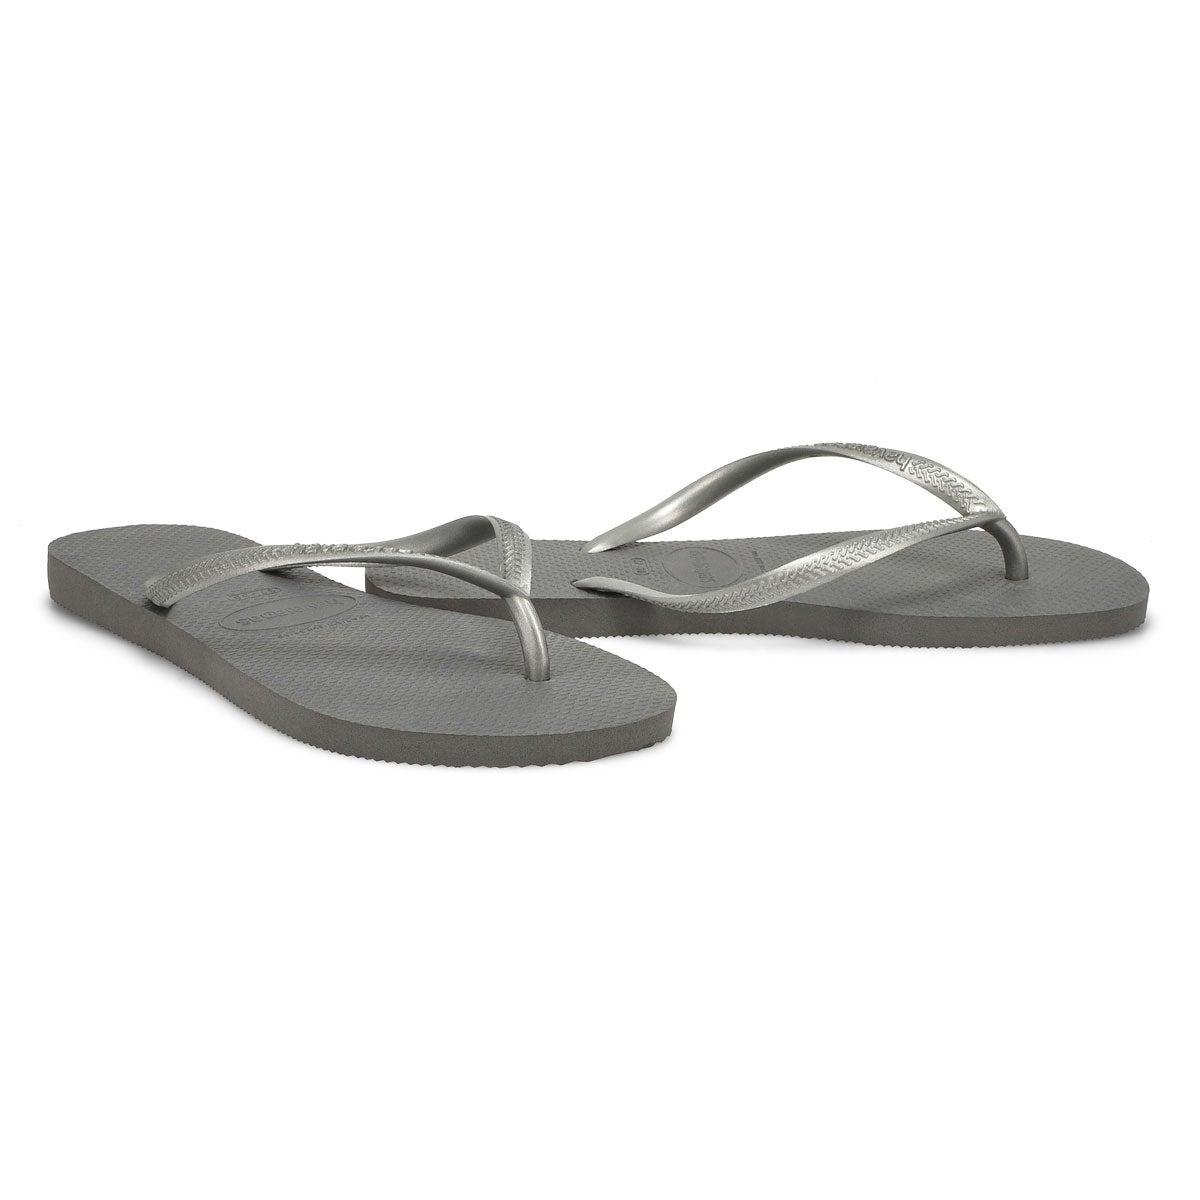 Women's Slim Flip Flop - Steel Grey